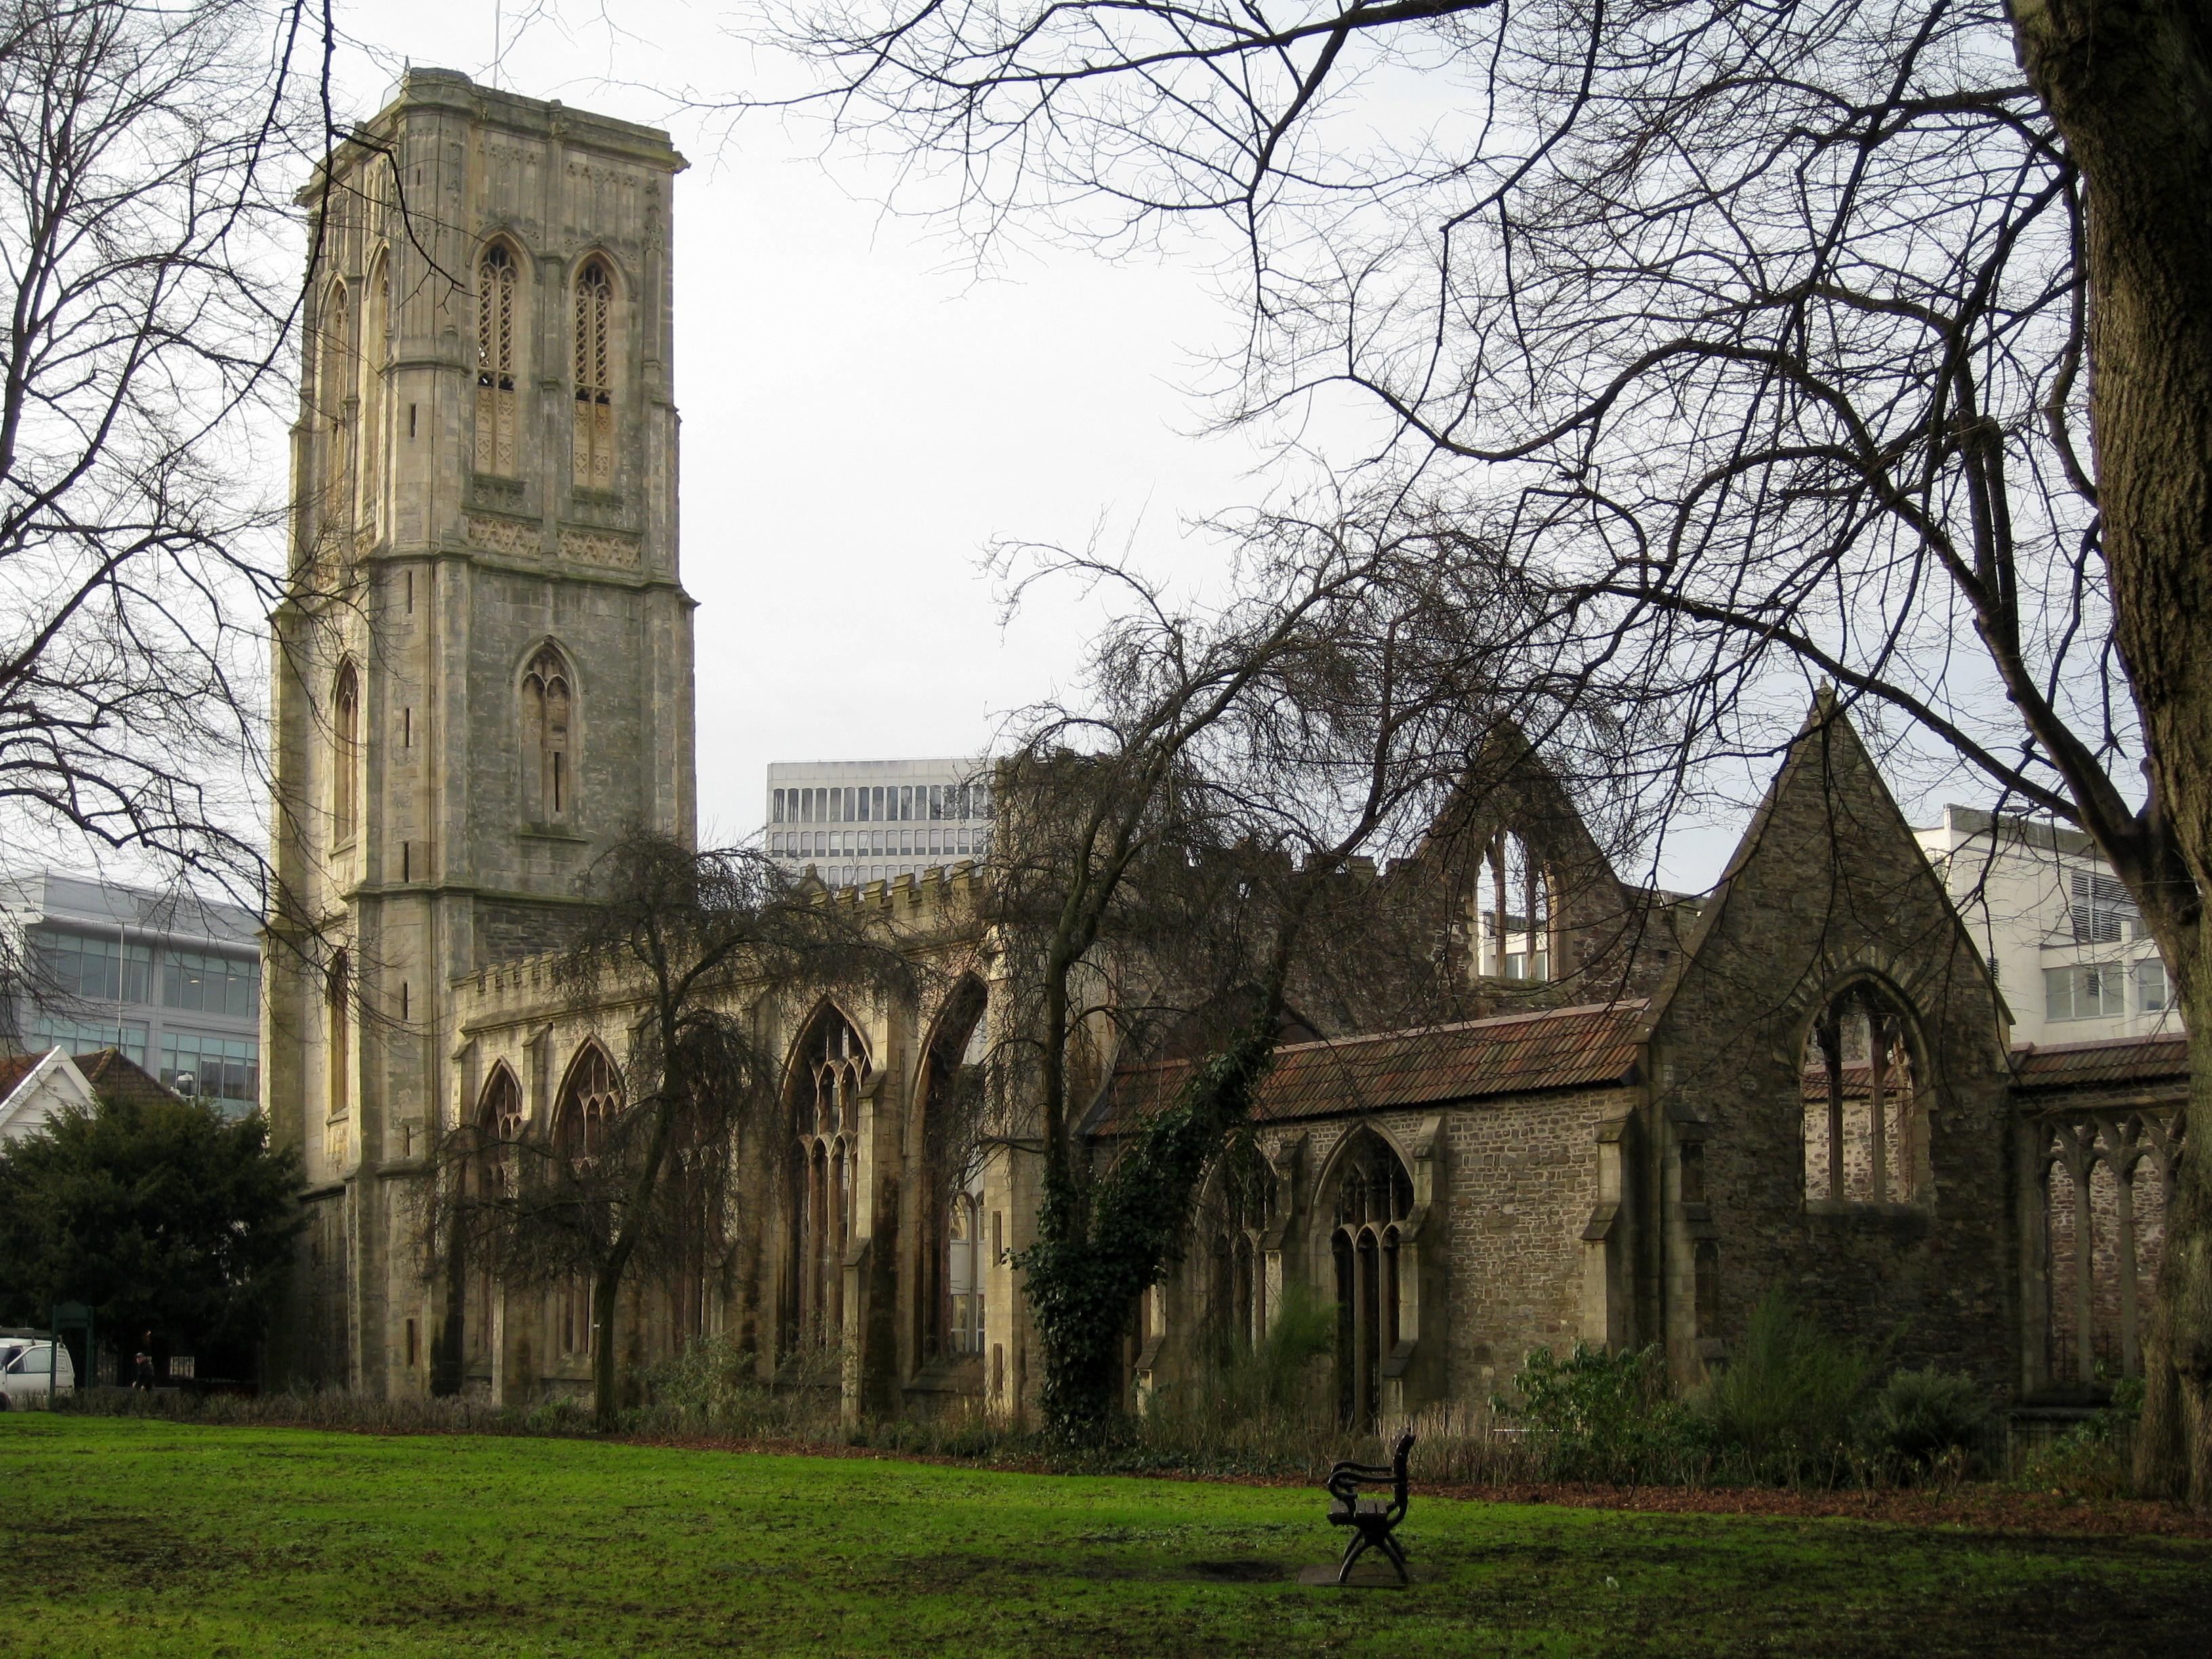 Nhà thờ Bristol